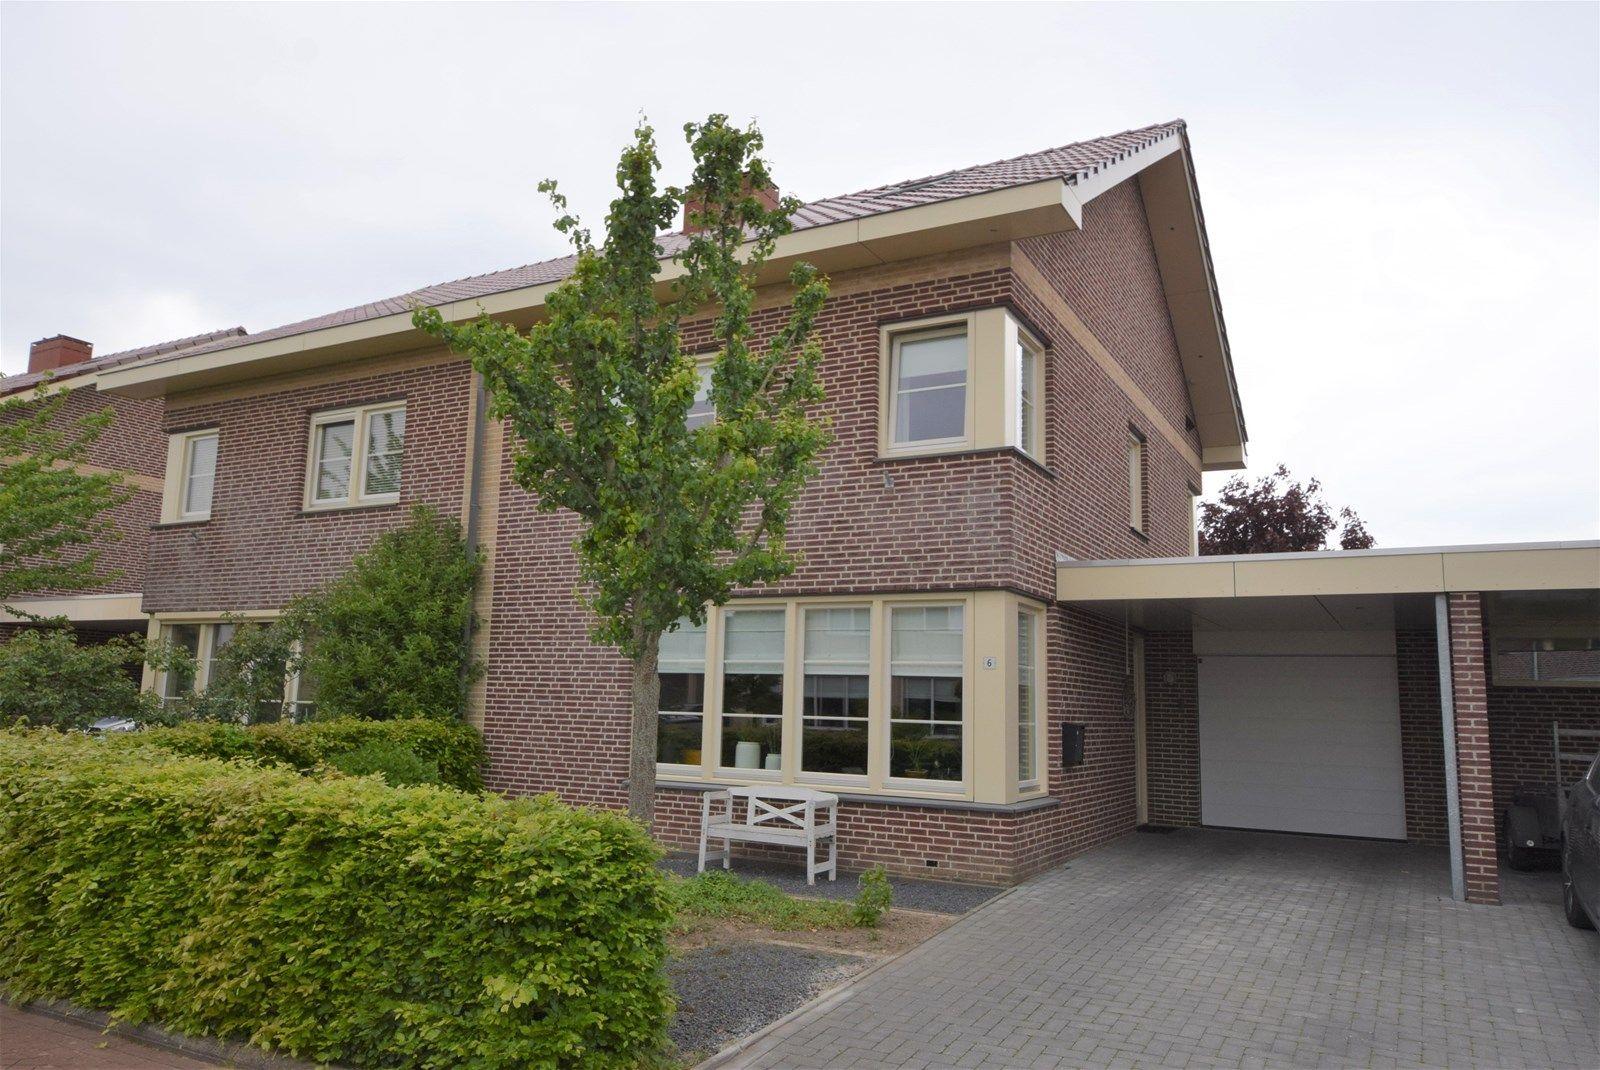 Pinksterbloemweg 6, Havelte